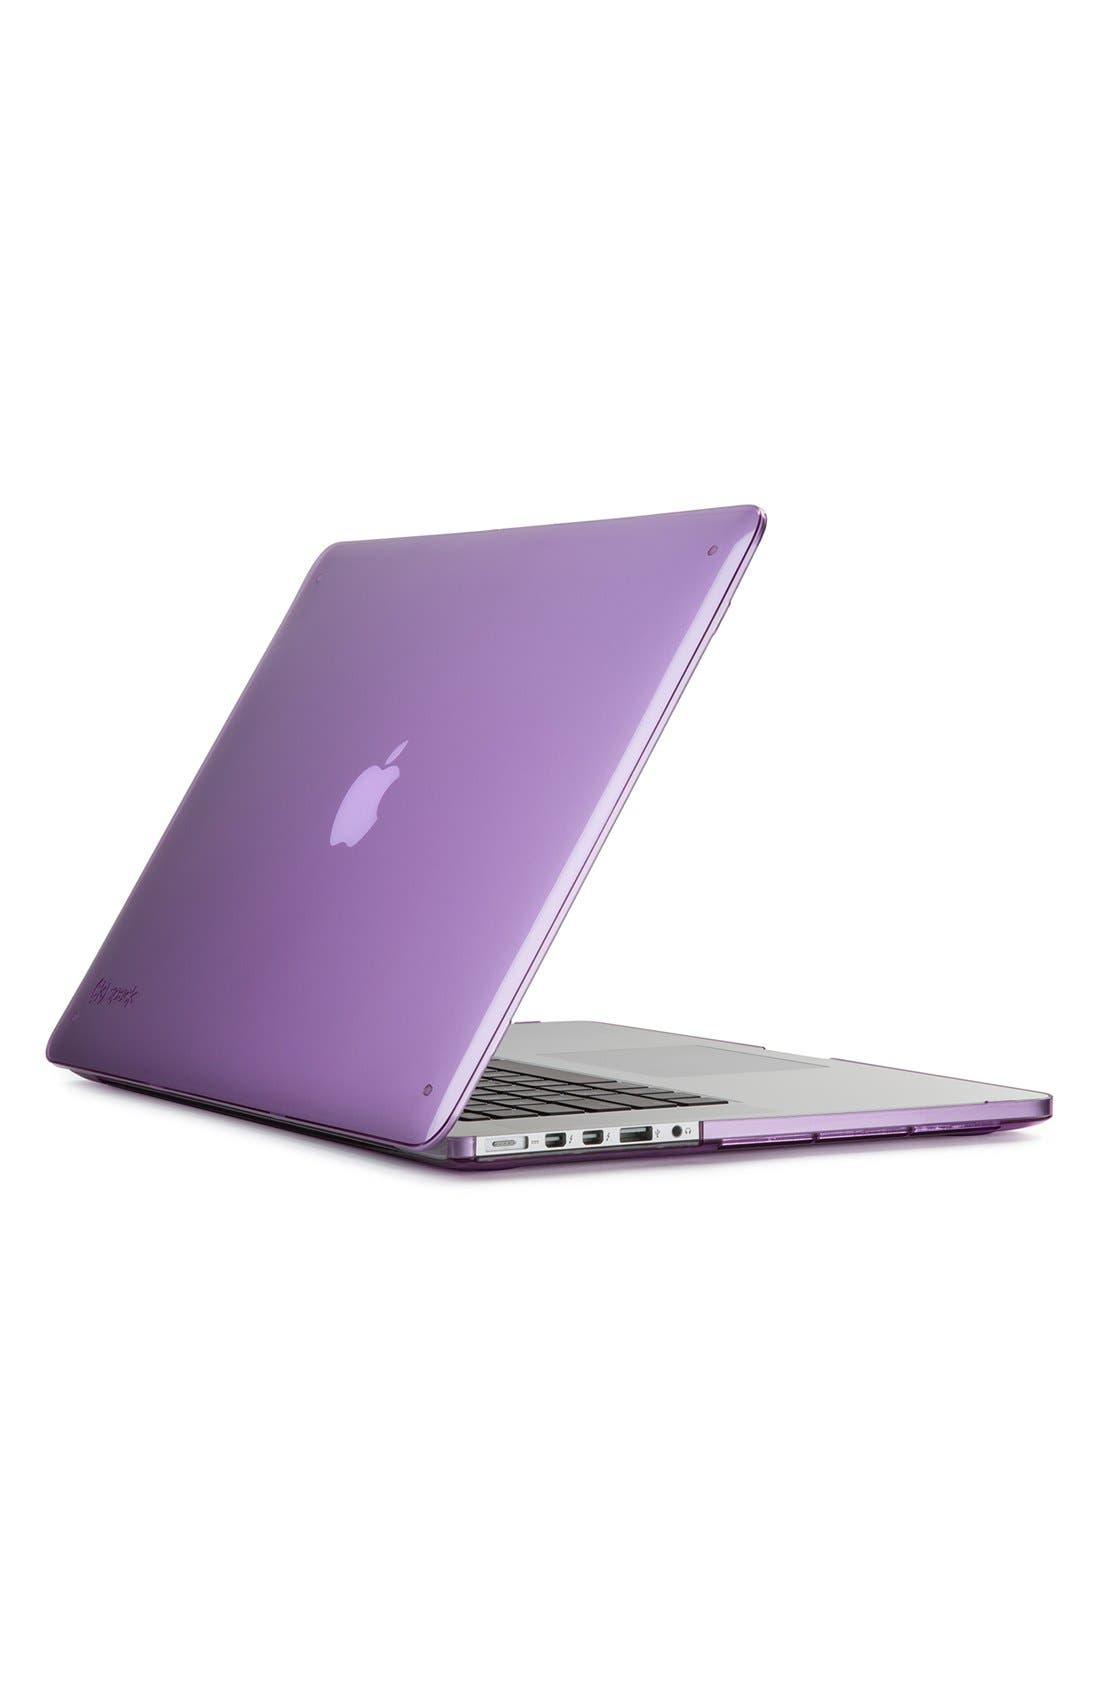 Main Image - Speck 'SmartShell' Snap-On MacBook Pro Retina Laptop Case (15 Inch)